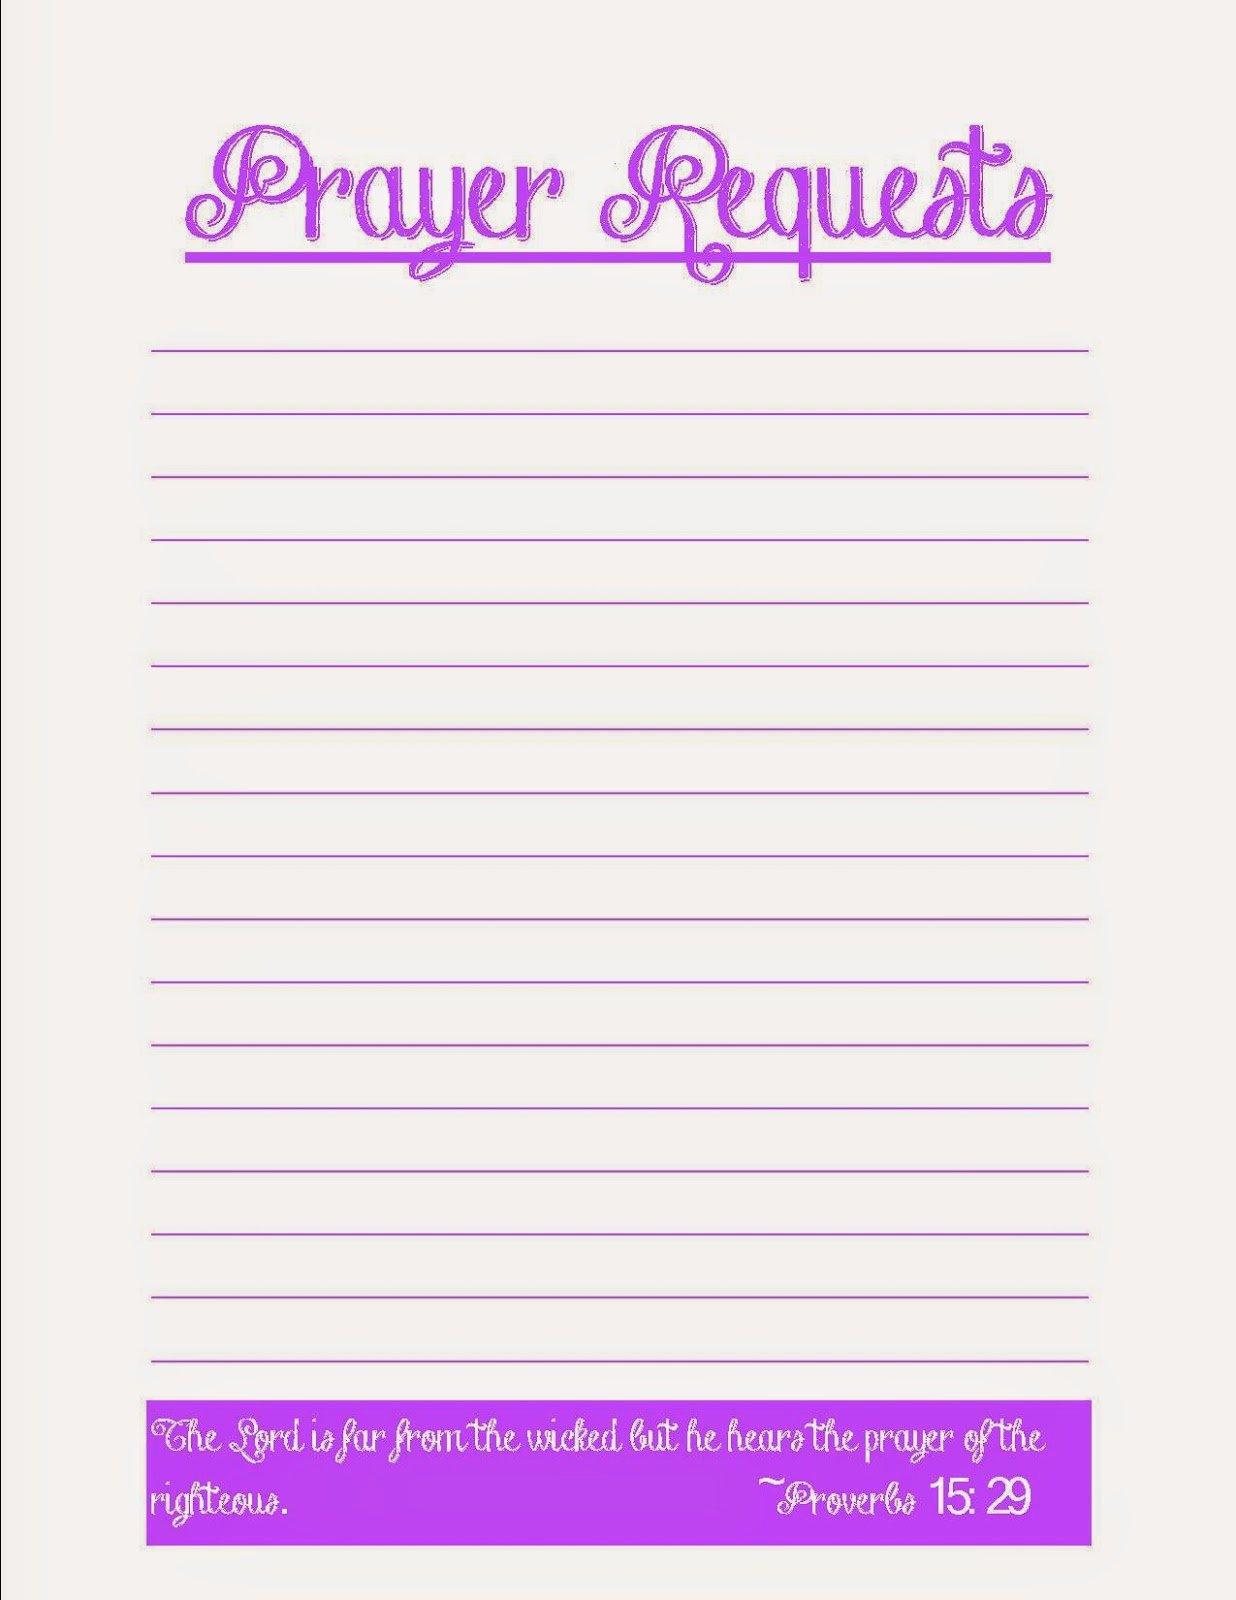 Prayer List Template Pdf Awesome Coffee Crafts & Cornfields Prayer Request Printables